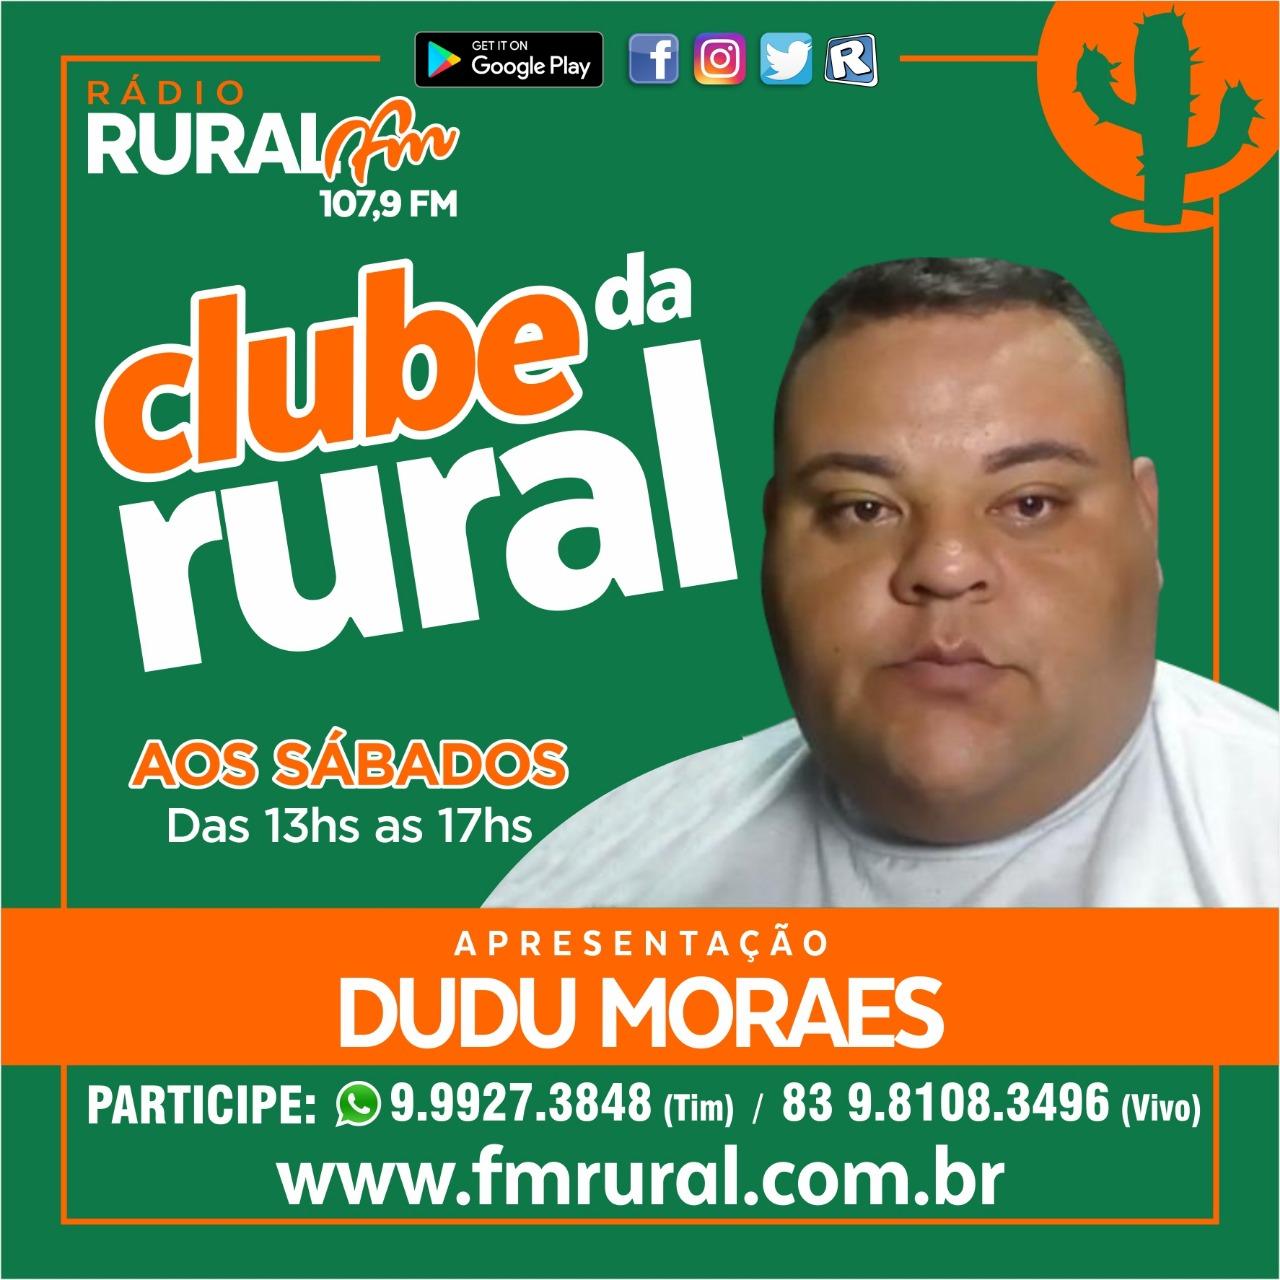 Clube da Rural - com Dudu Moraes